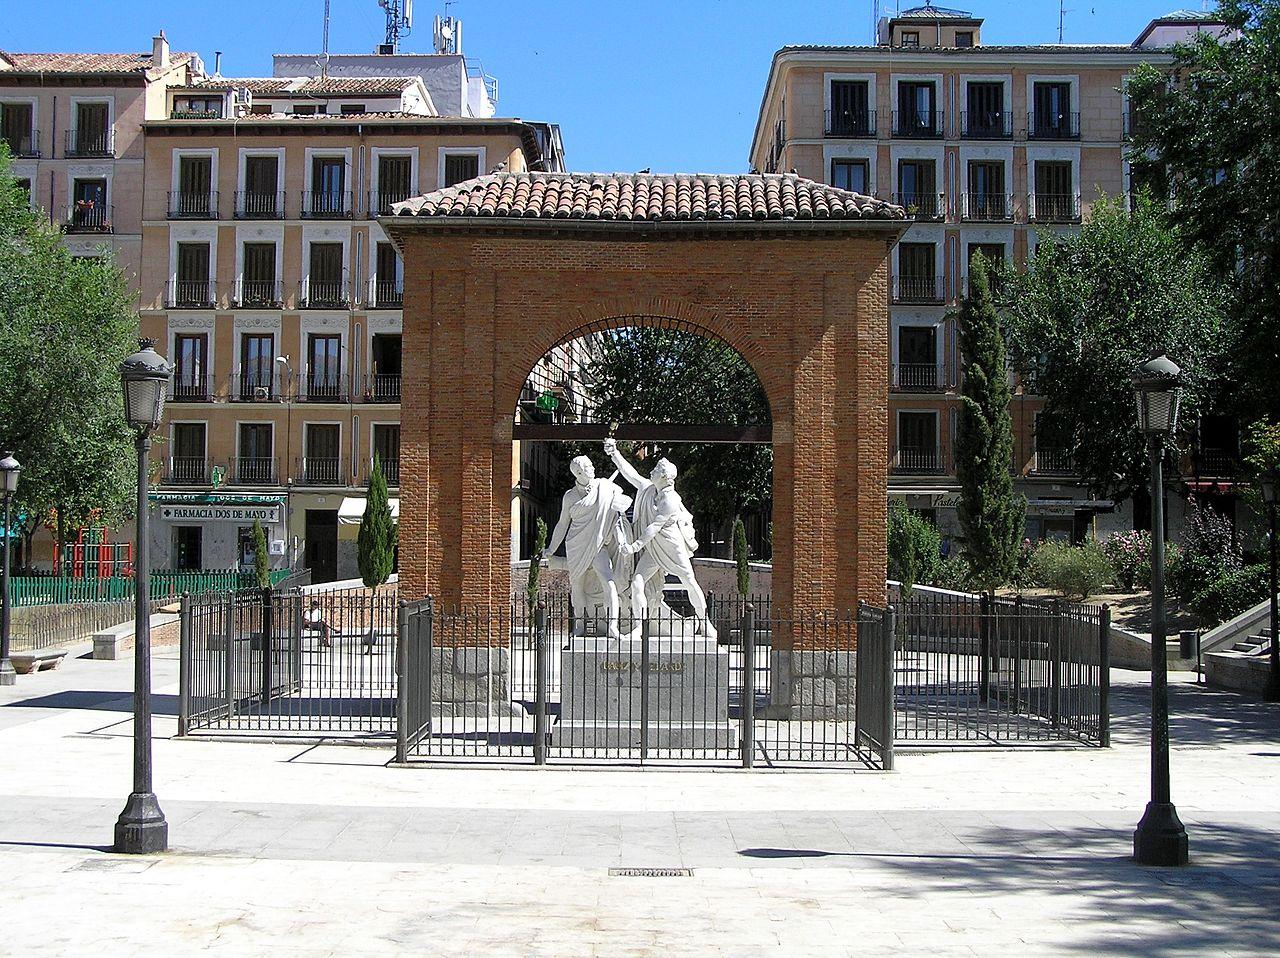 monumento daoiz y velarde